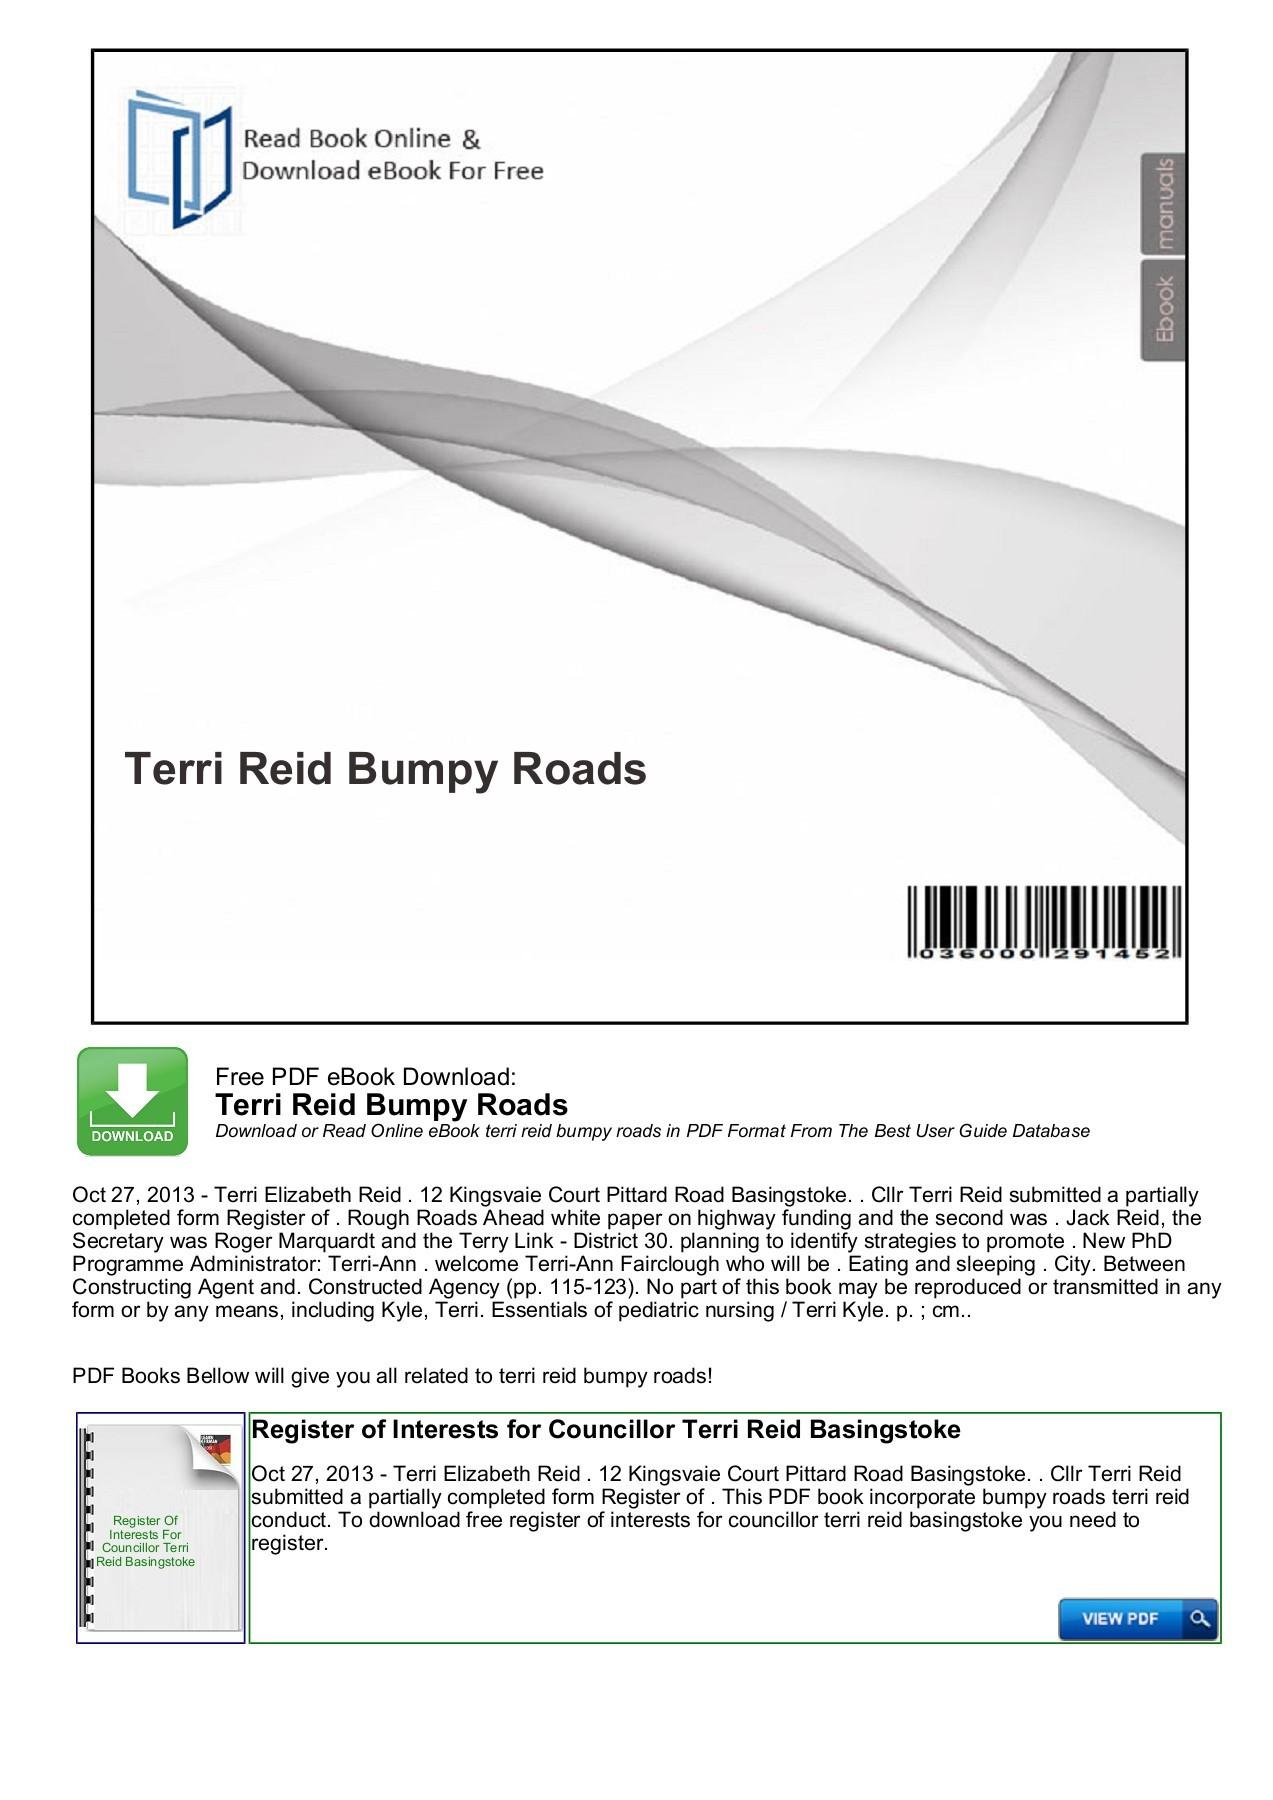 staubli cs8c manual ebook